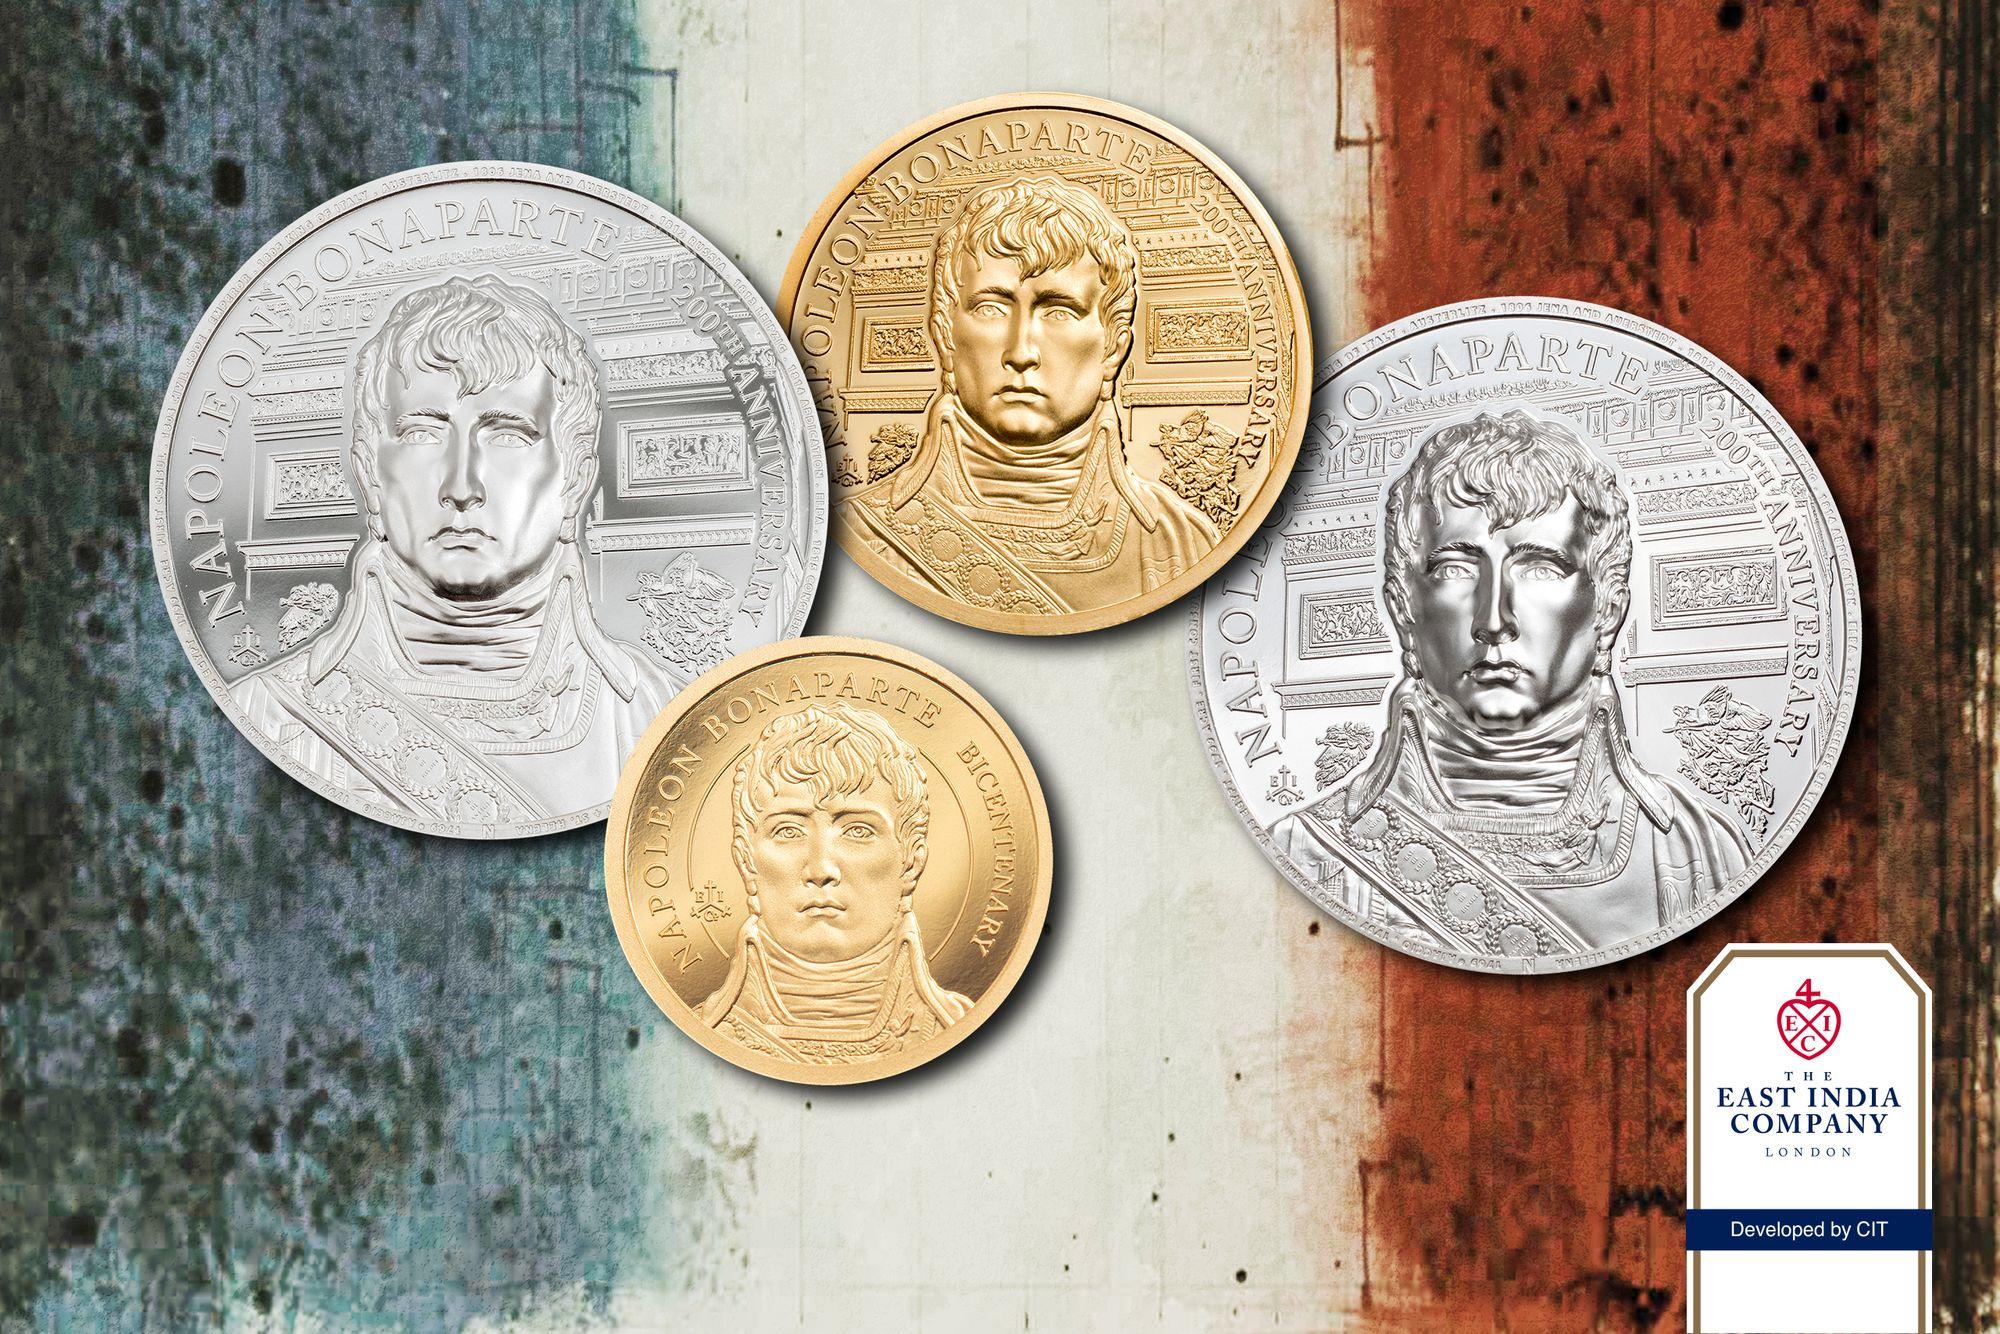 2021 Napoleon 200th Anniversary of Death Coin Series